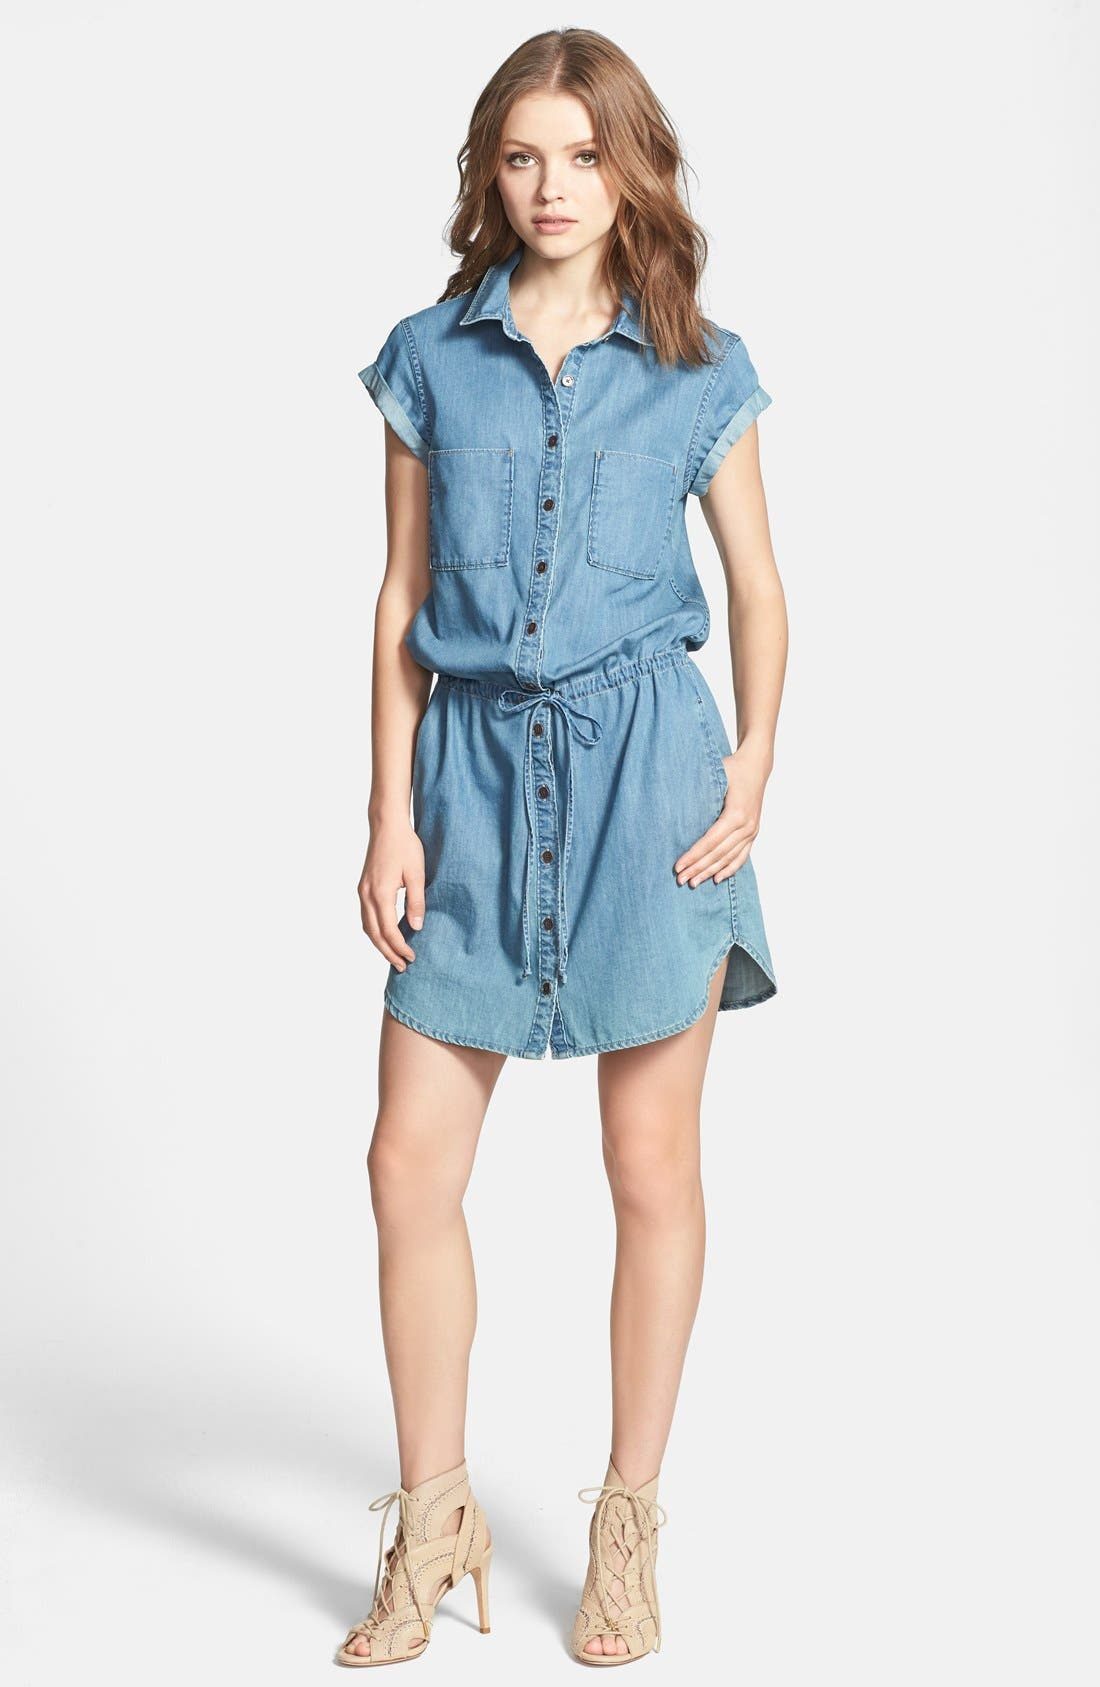 Alternate Image 1 Selected - Paige Denim 'Mila' Denim Shirtdress